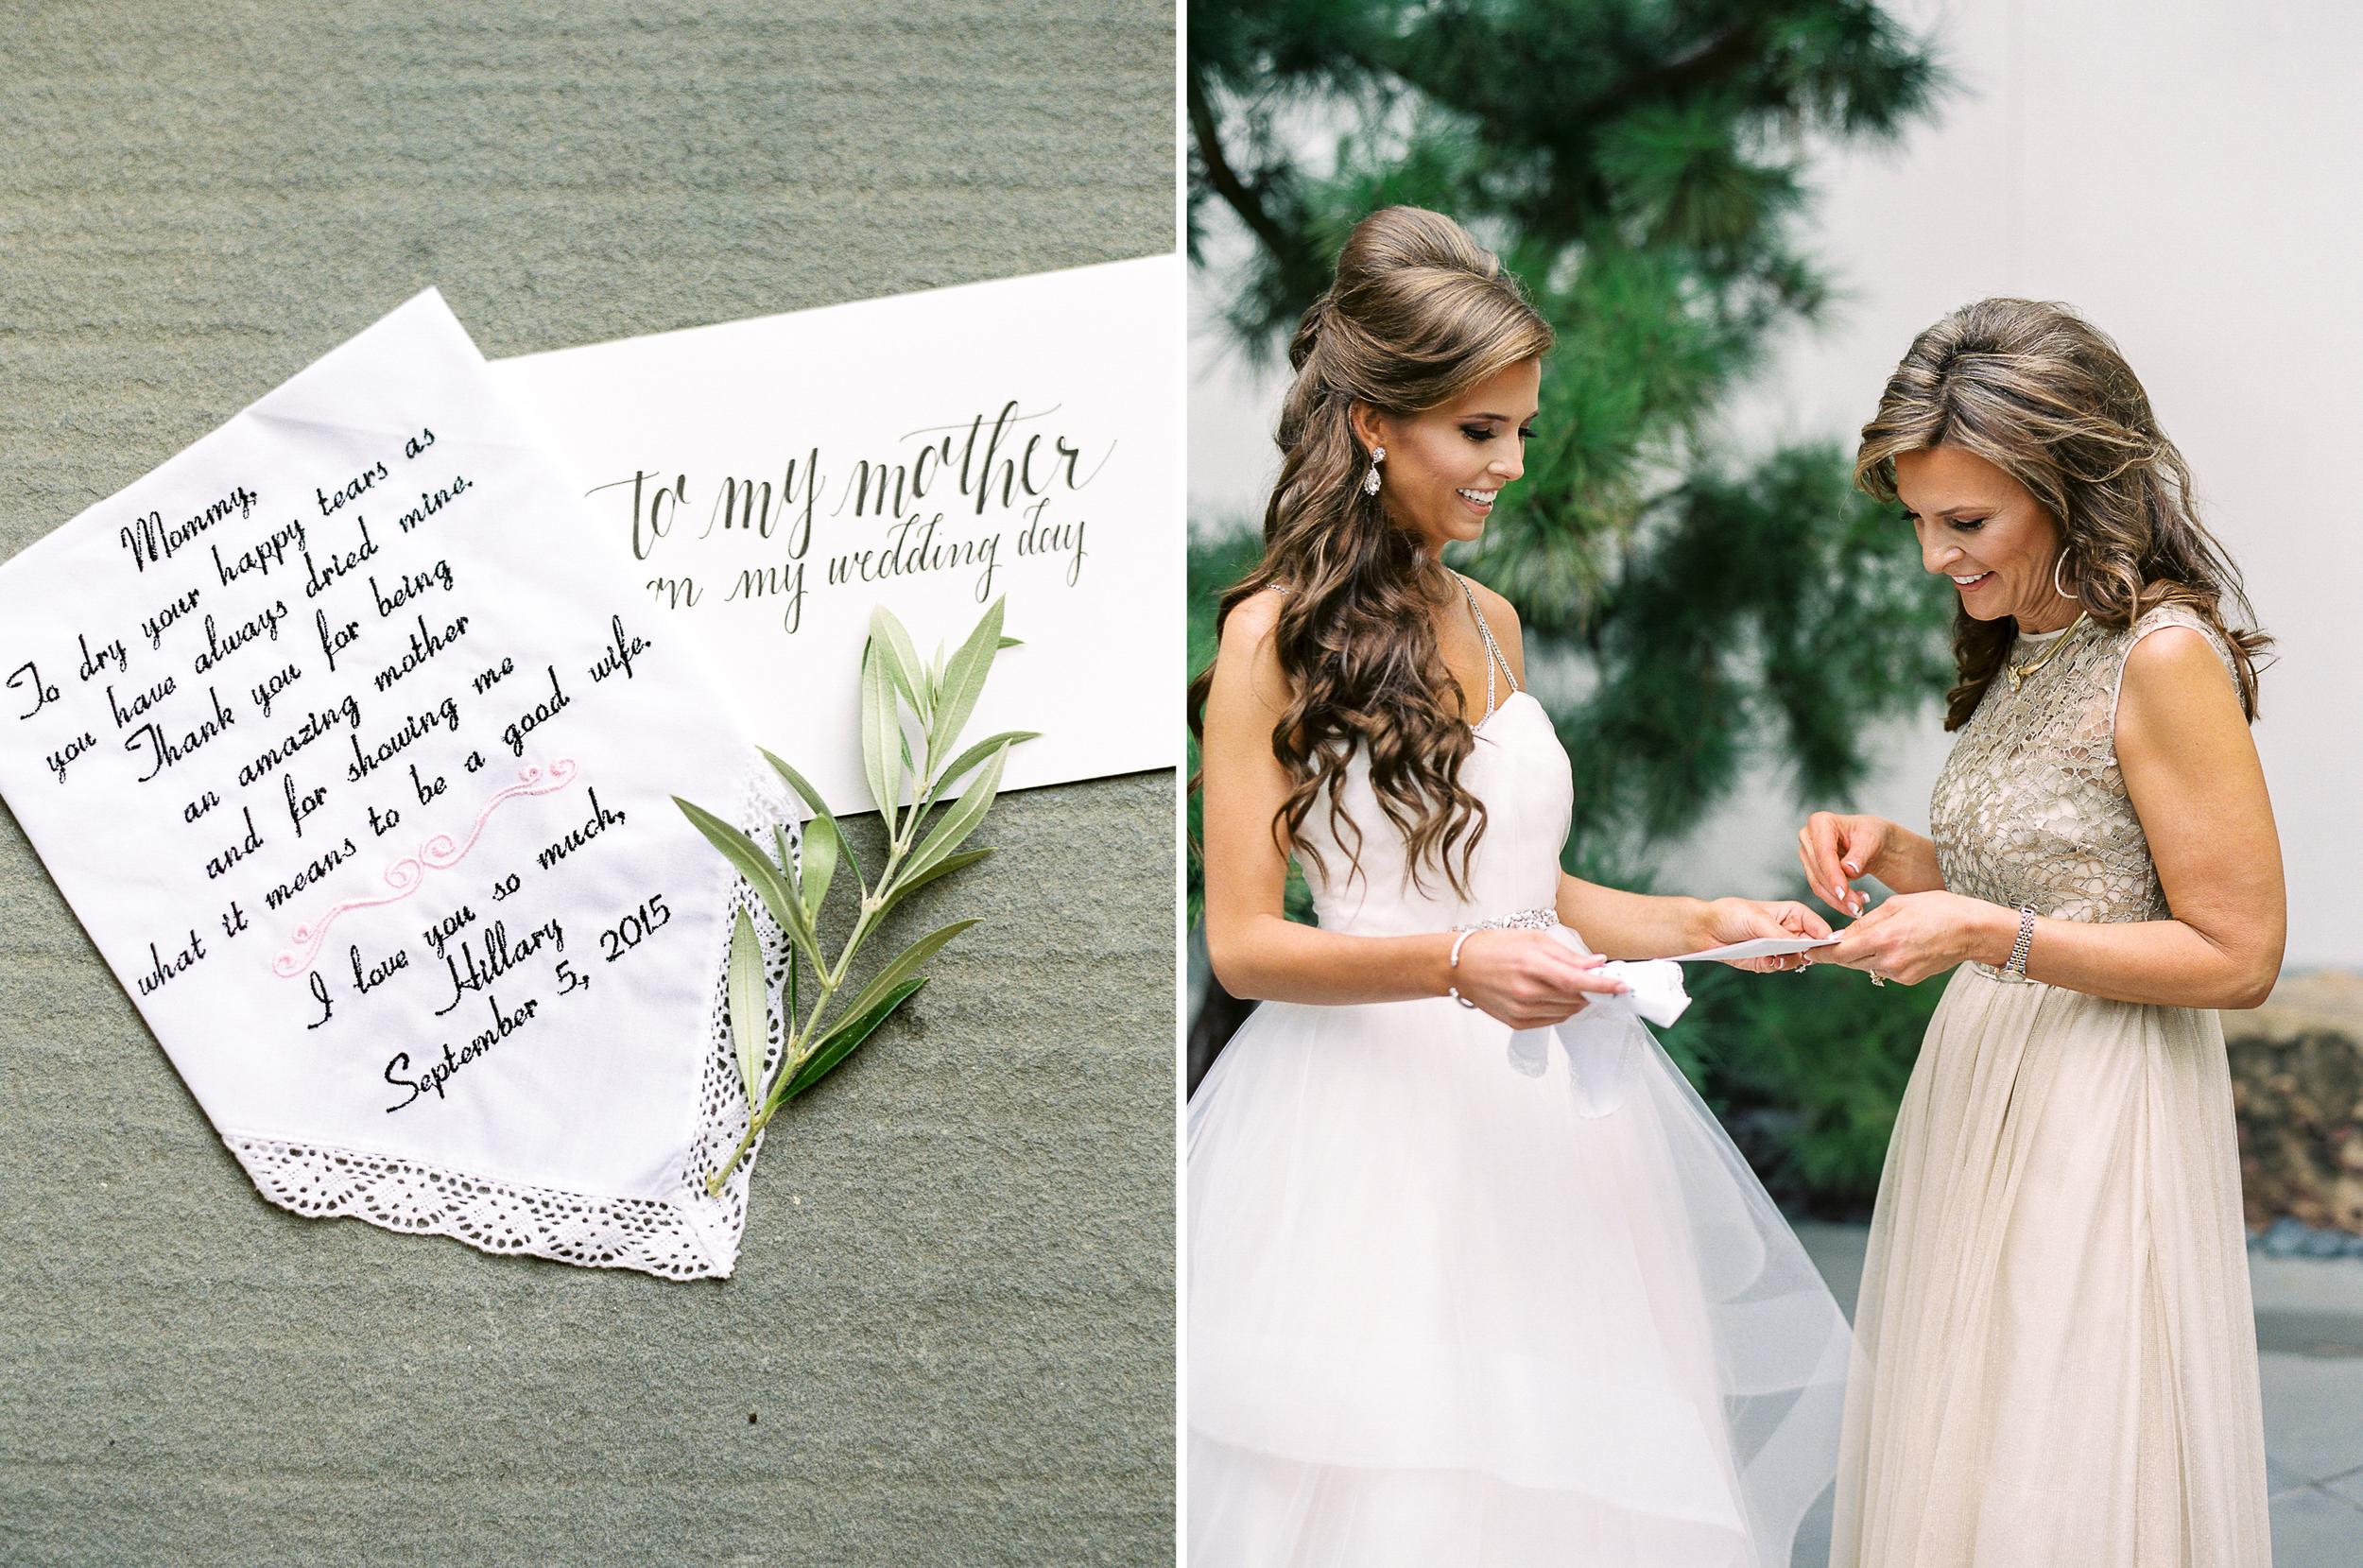 Dana-Fernandez-Photography-Weddings-in-Houston-Magazine-feature-Houston-wedding-photographer-film-103.jpg